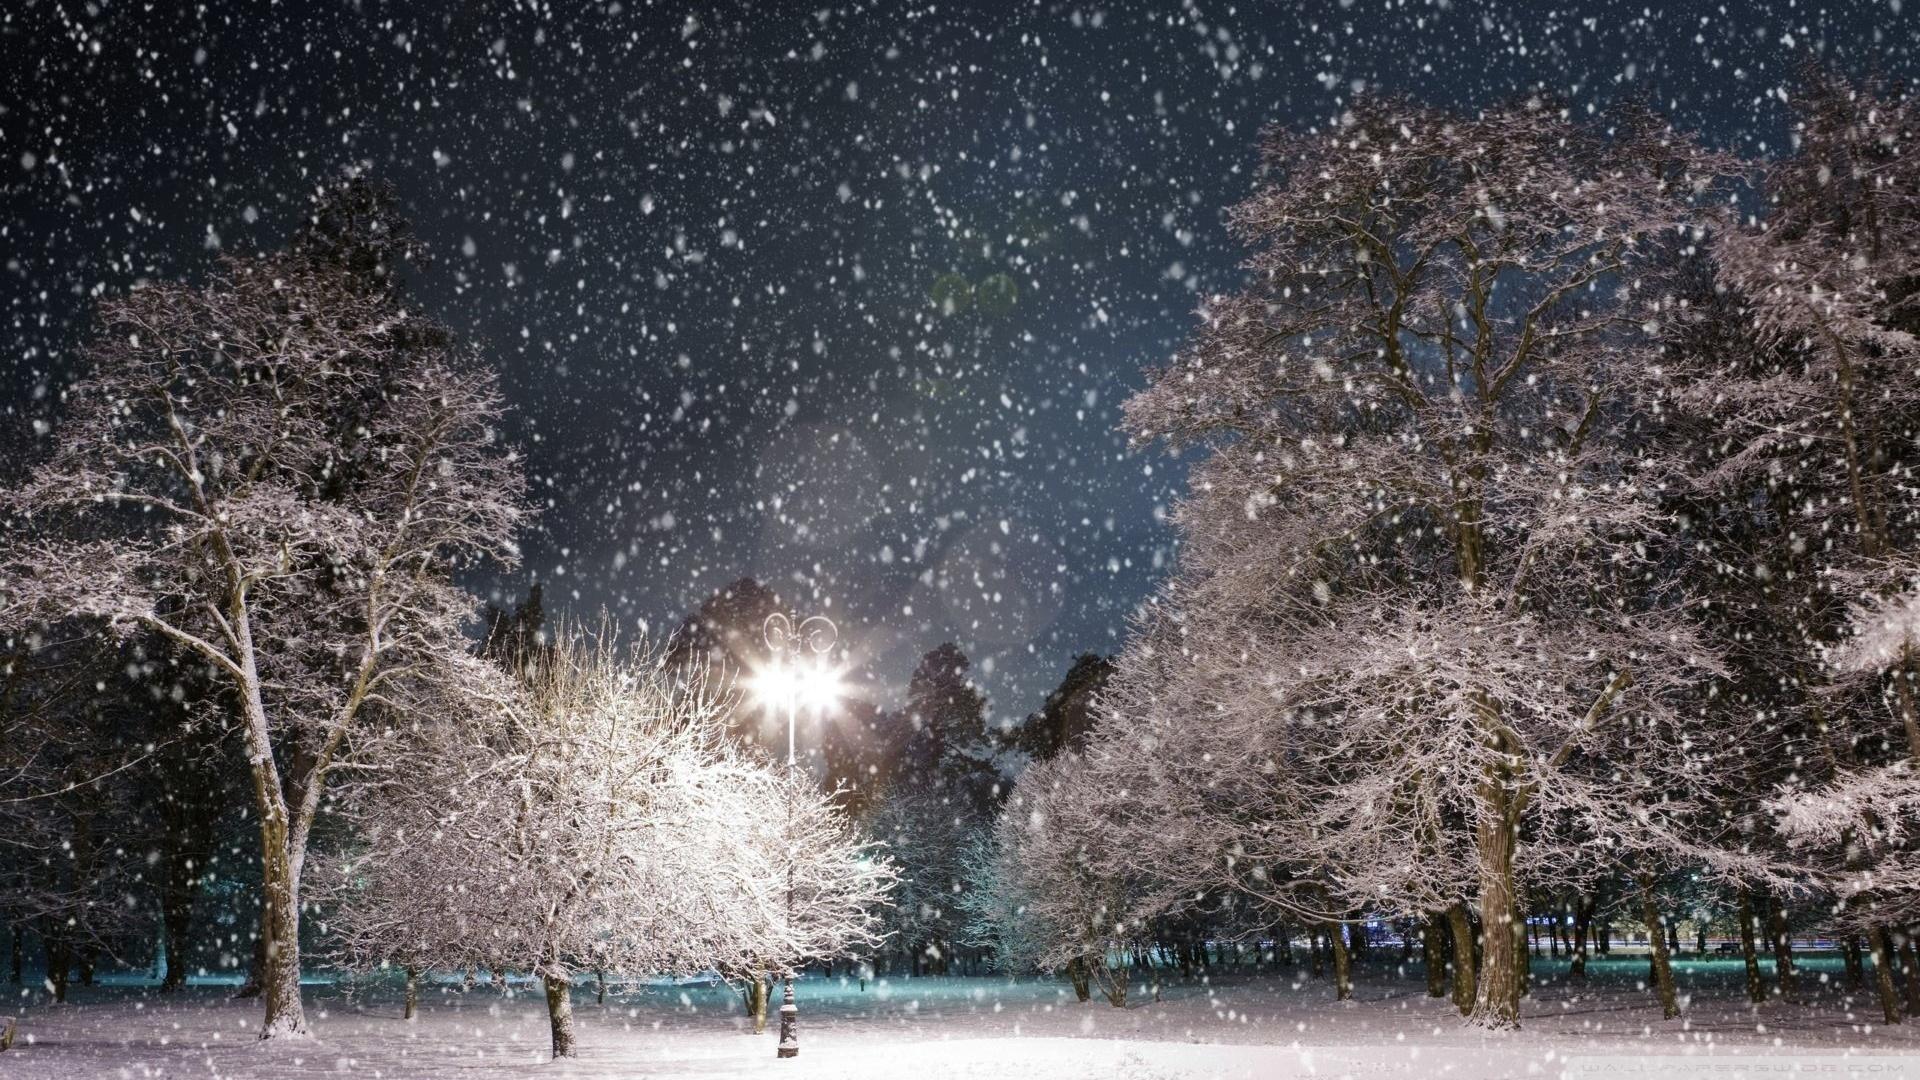 Snow At Night Wallpaper 1920x1080 Snow At Night 1920x1080